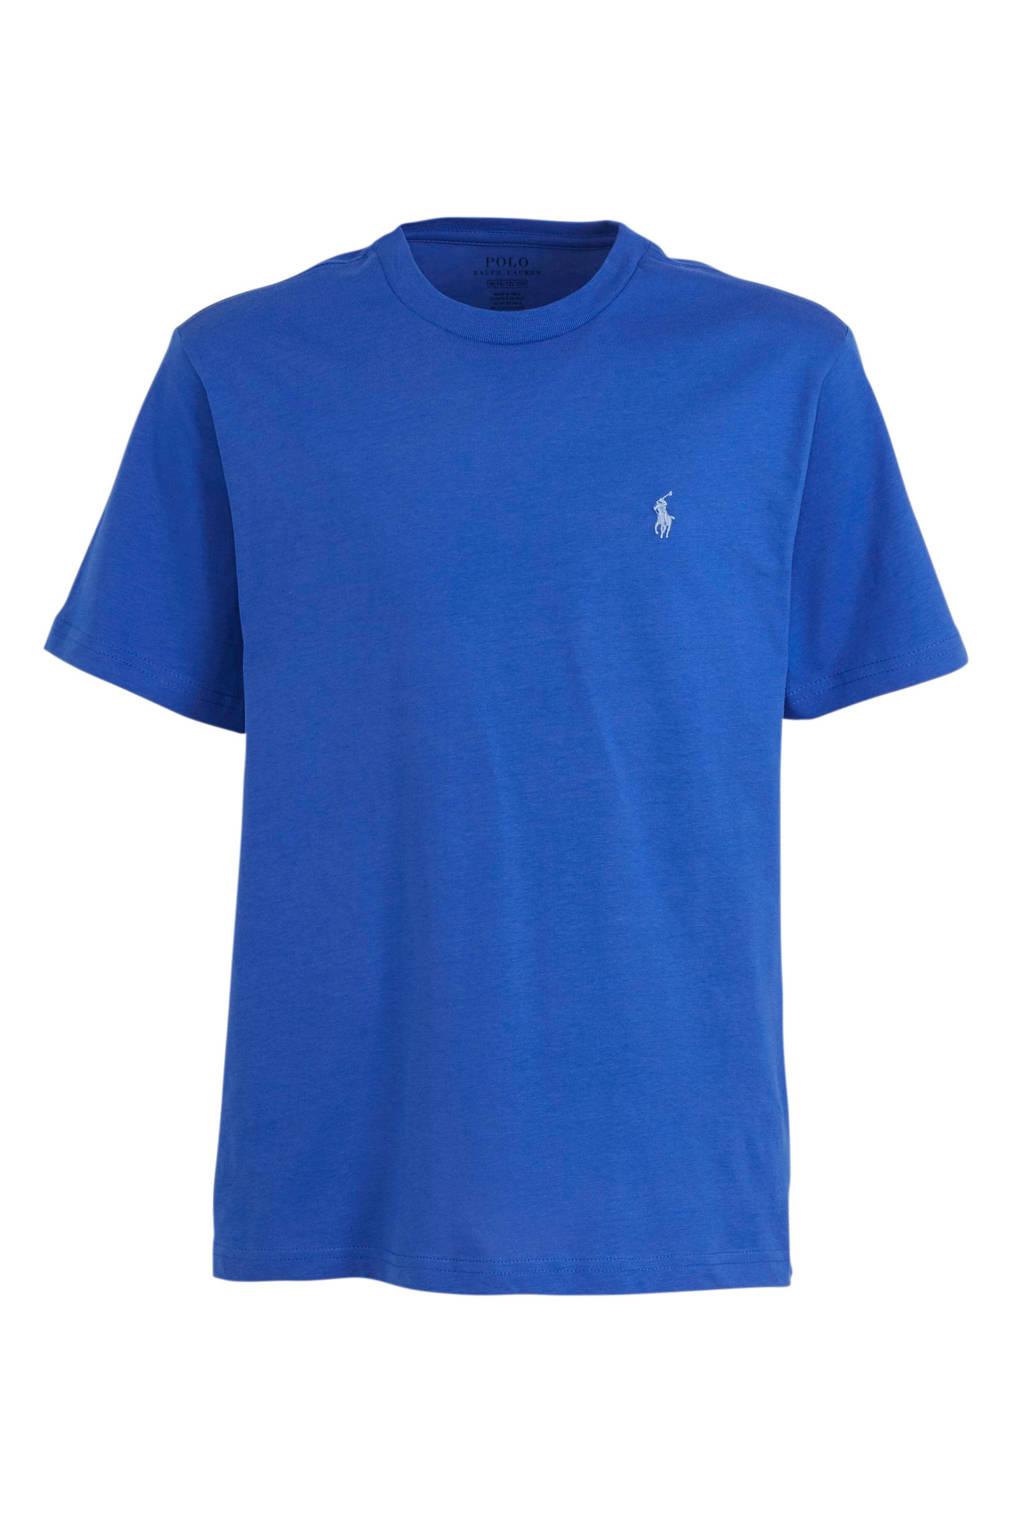 POLO Ralph Lauren T-shirt met logoborduursels blauw, Blauw/lichtblauw